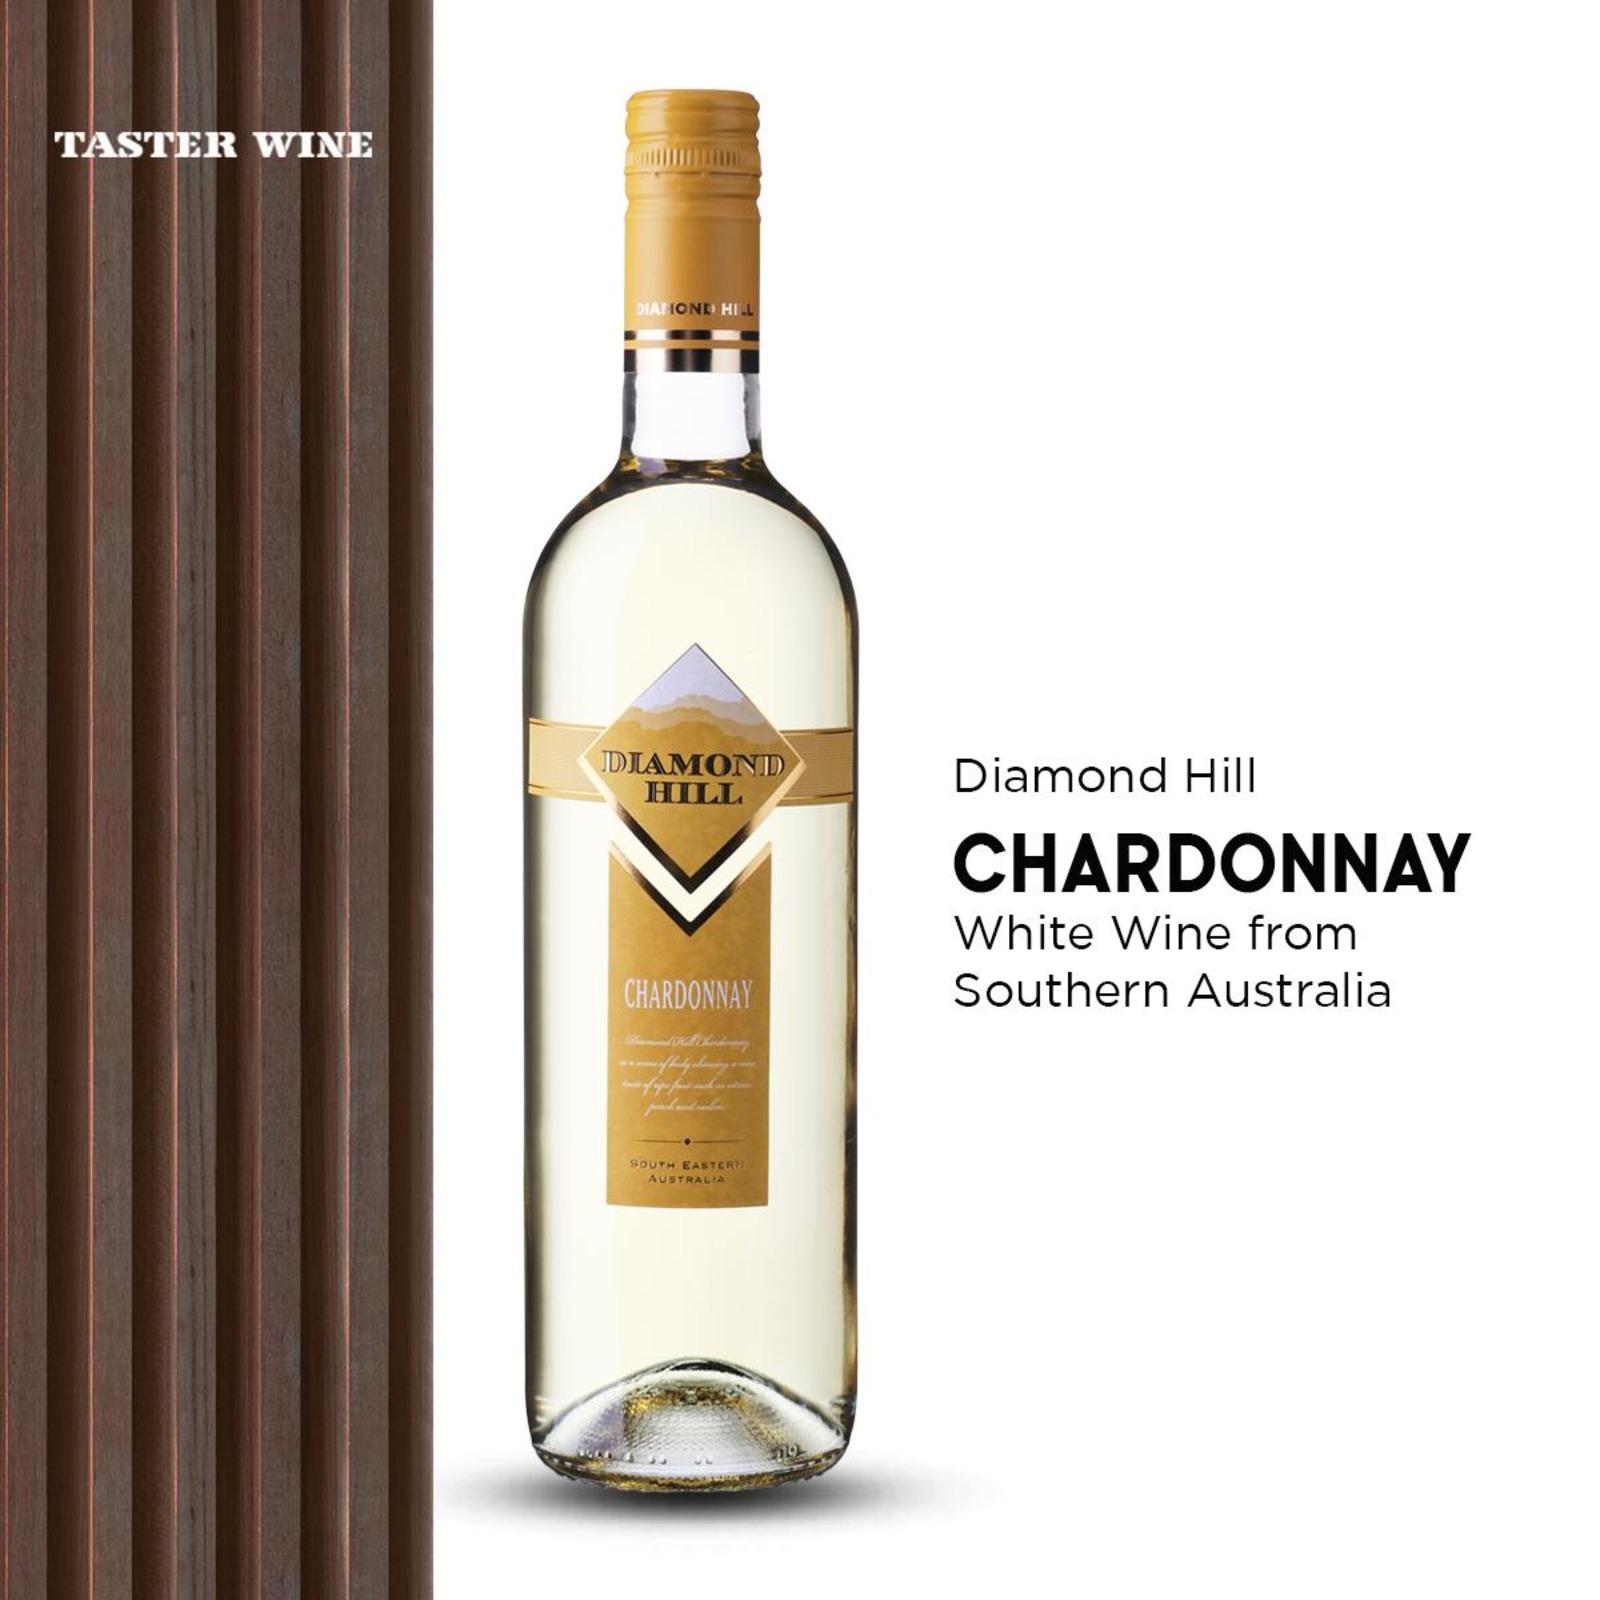 Diamond Hill Chardonnay - White Wine